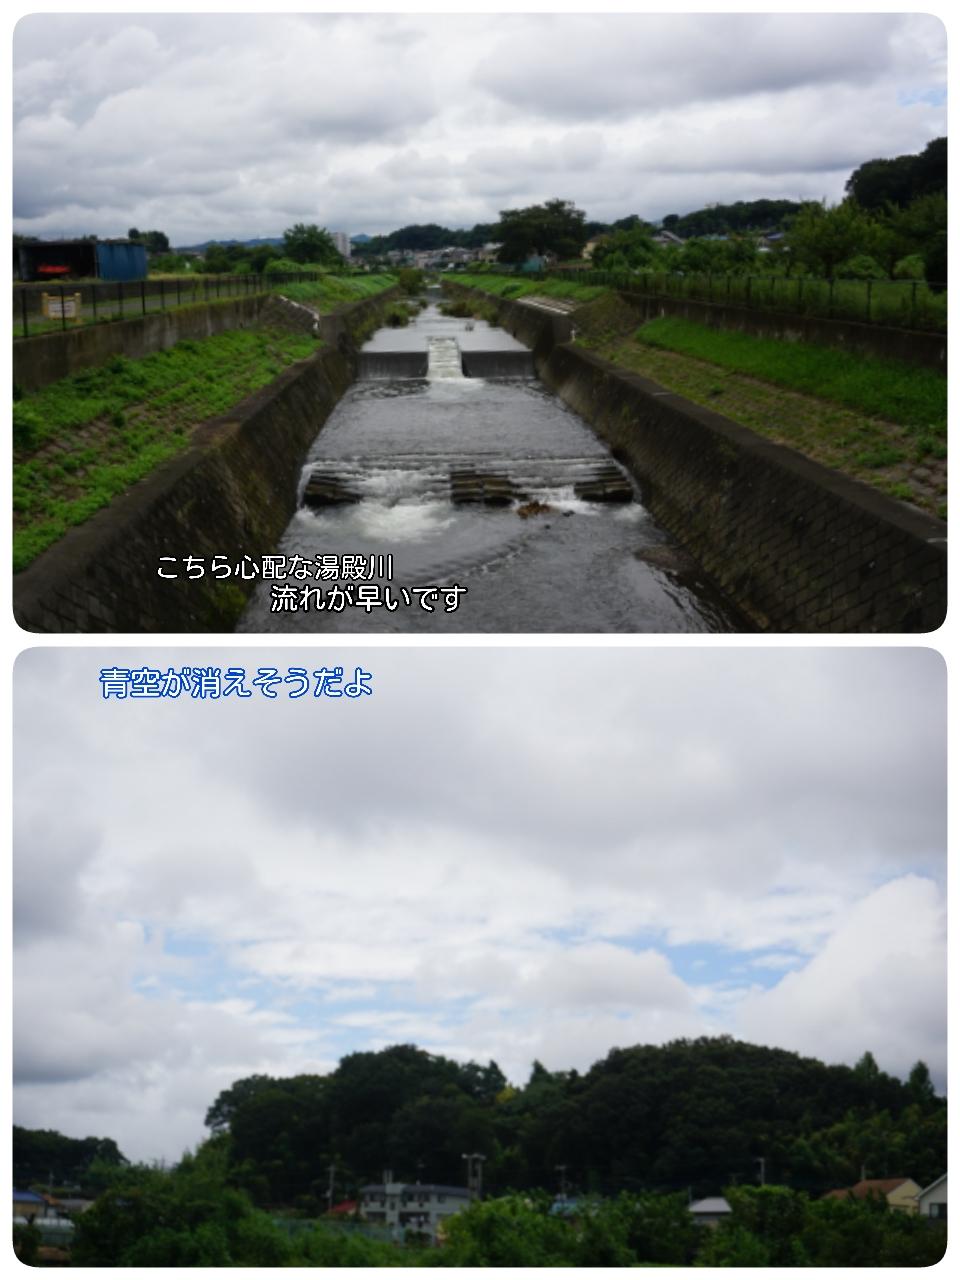 16-08-29-13-14-12-801_deco.jpg